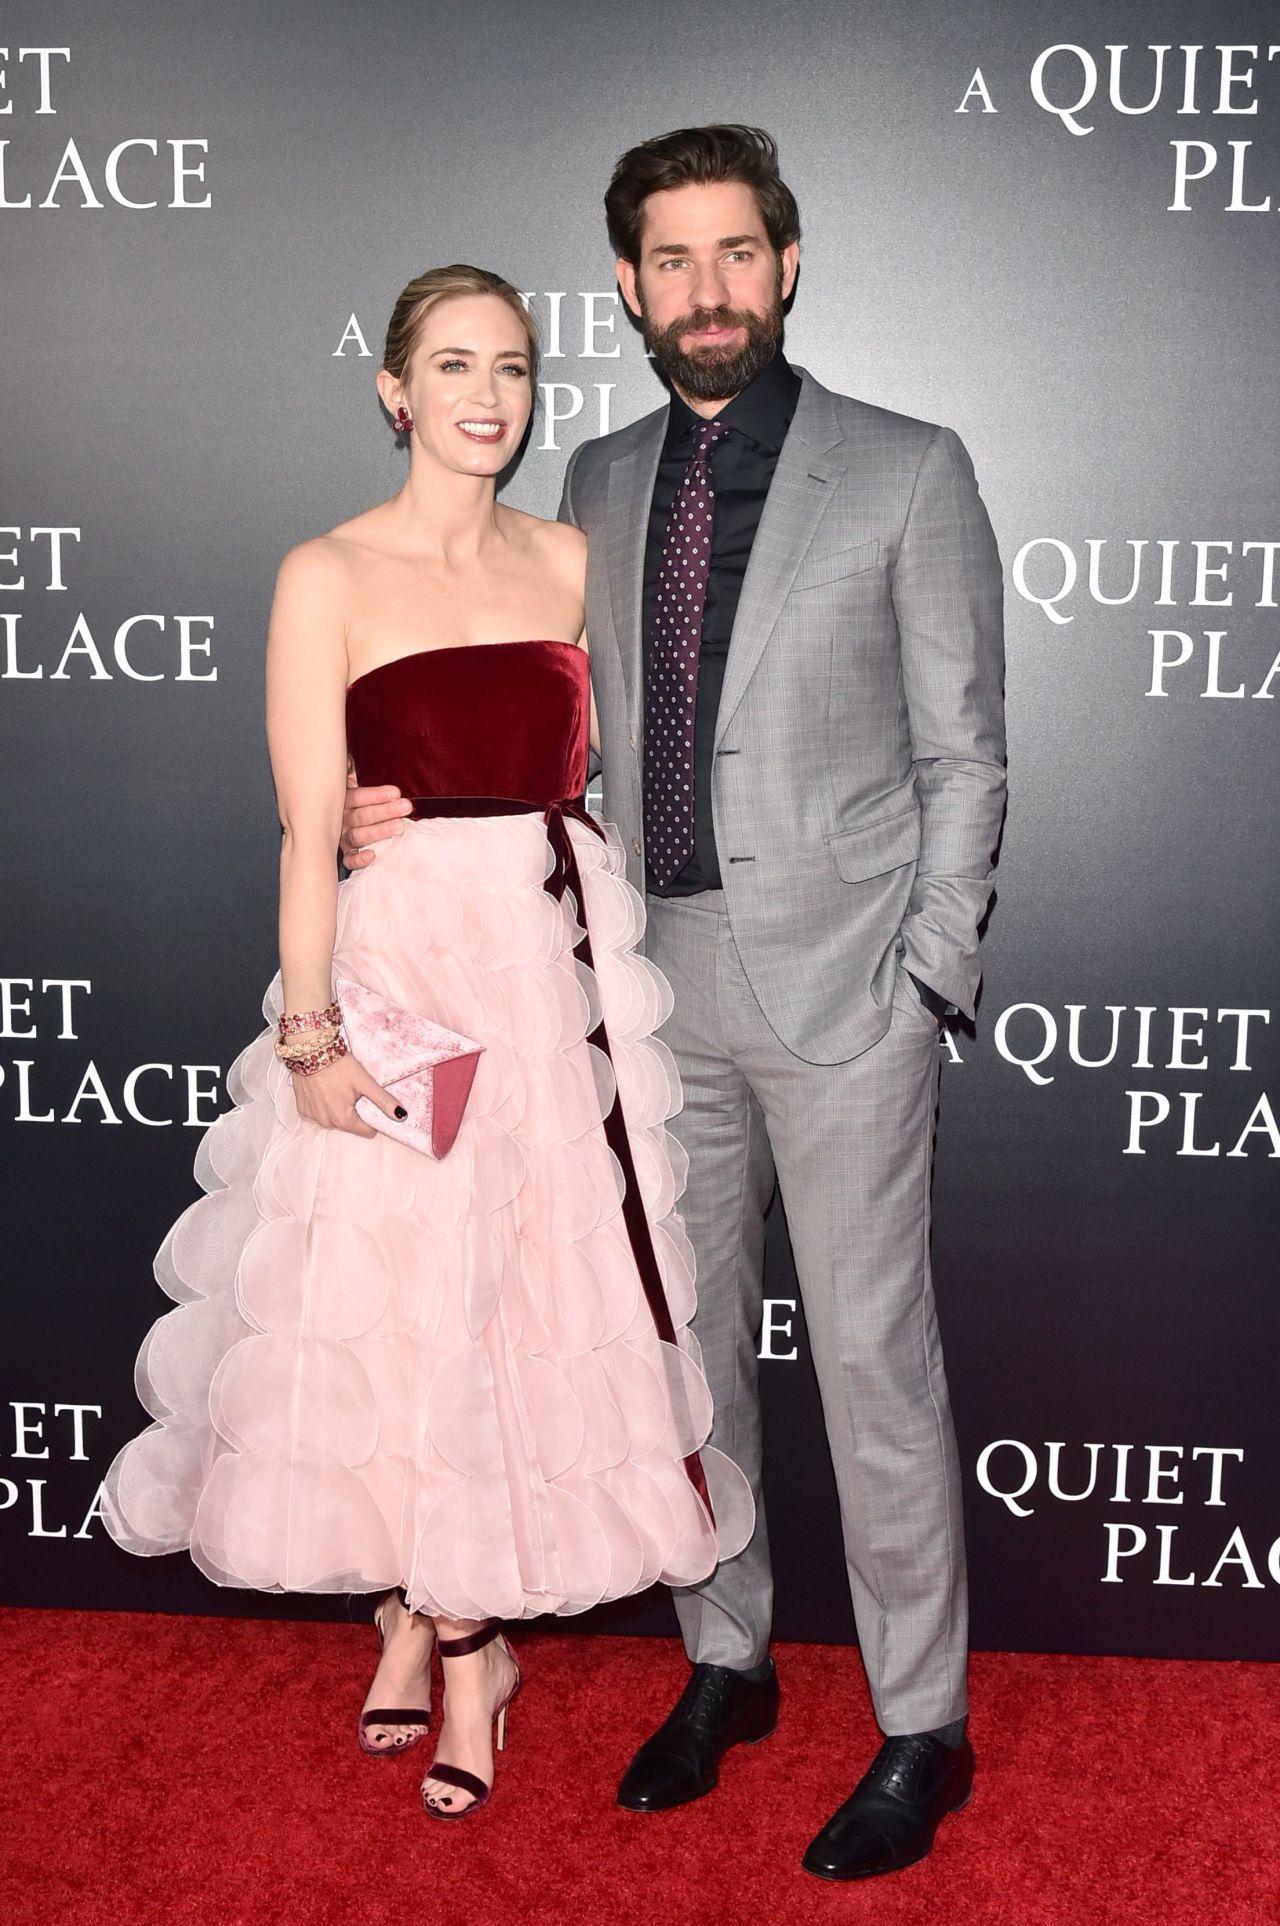 Emily Blunt And John Krasinski A Quiet Place Premiere